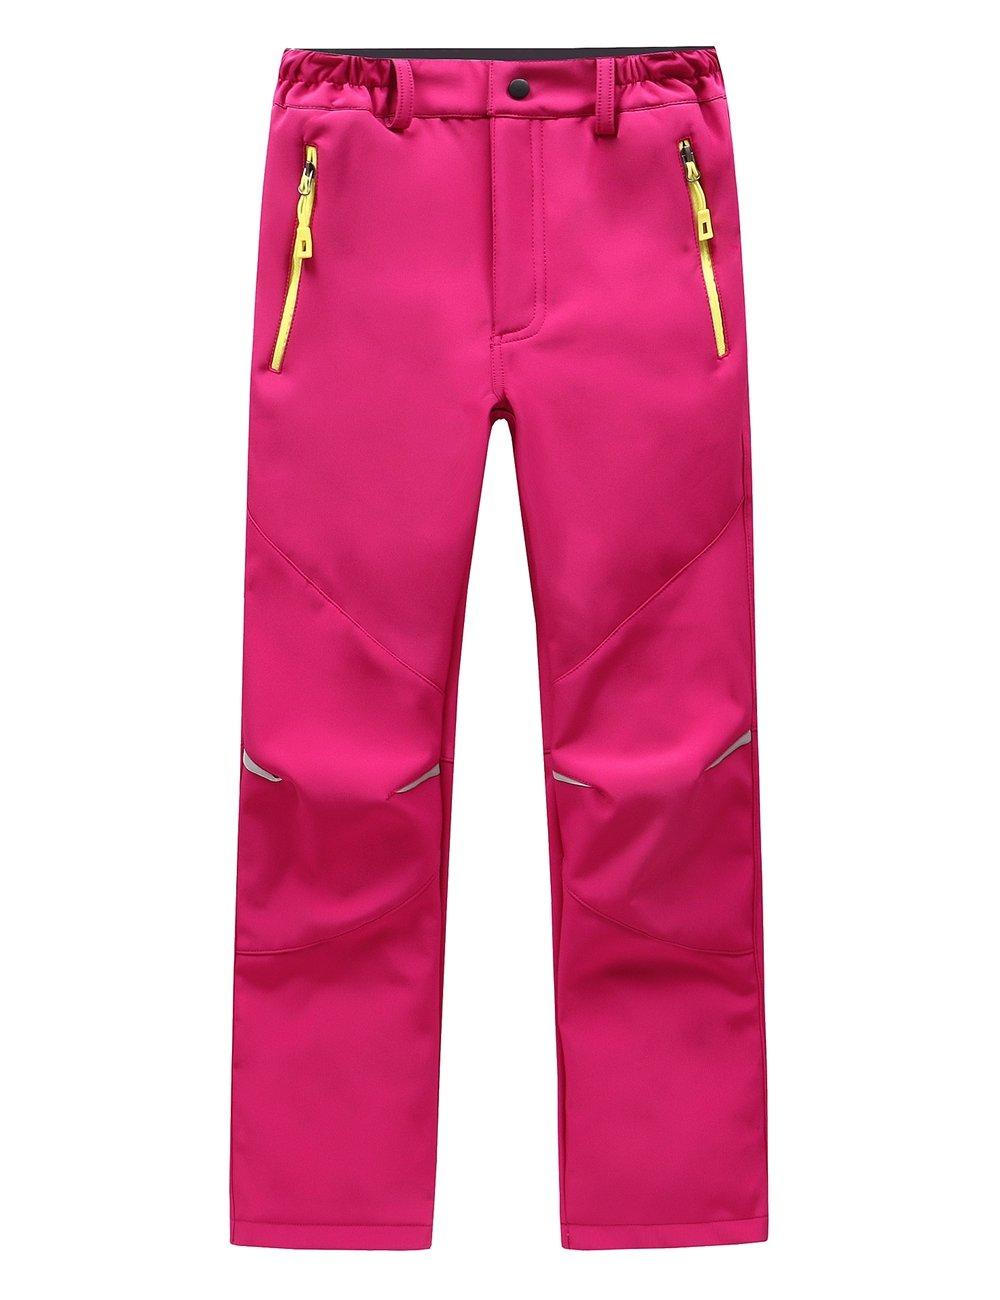 SANKE Kids Boys Girls Waterproof Outdoor Hiking Ski Pants Warm Fleece Lined